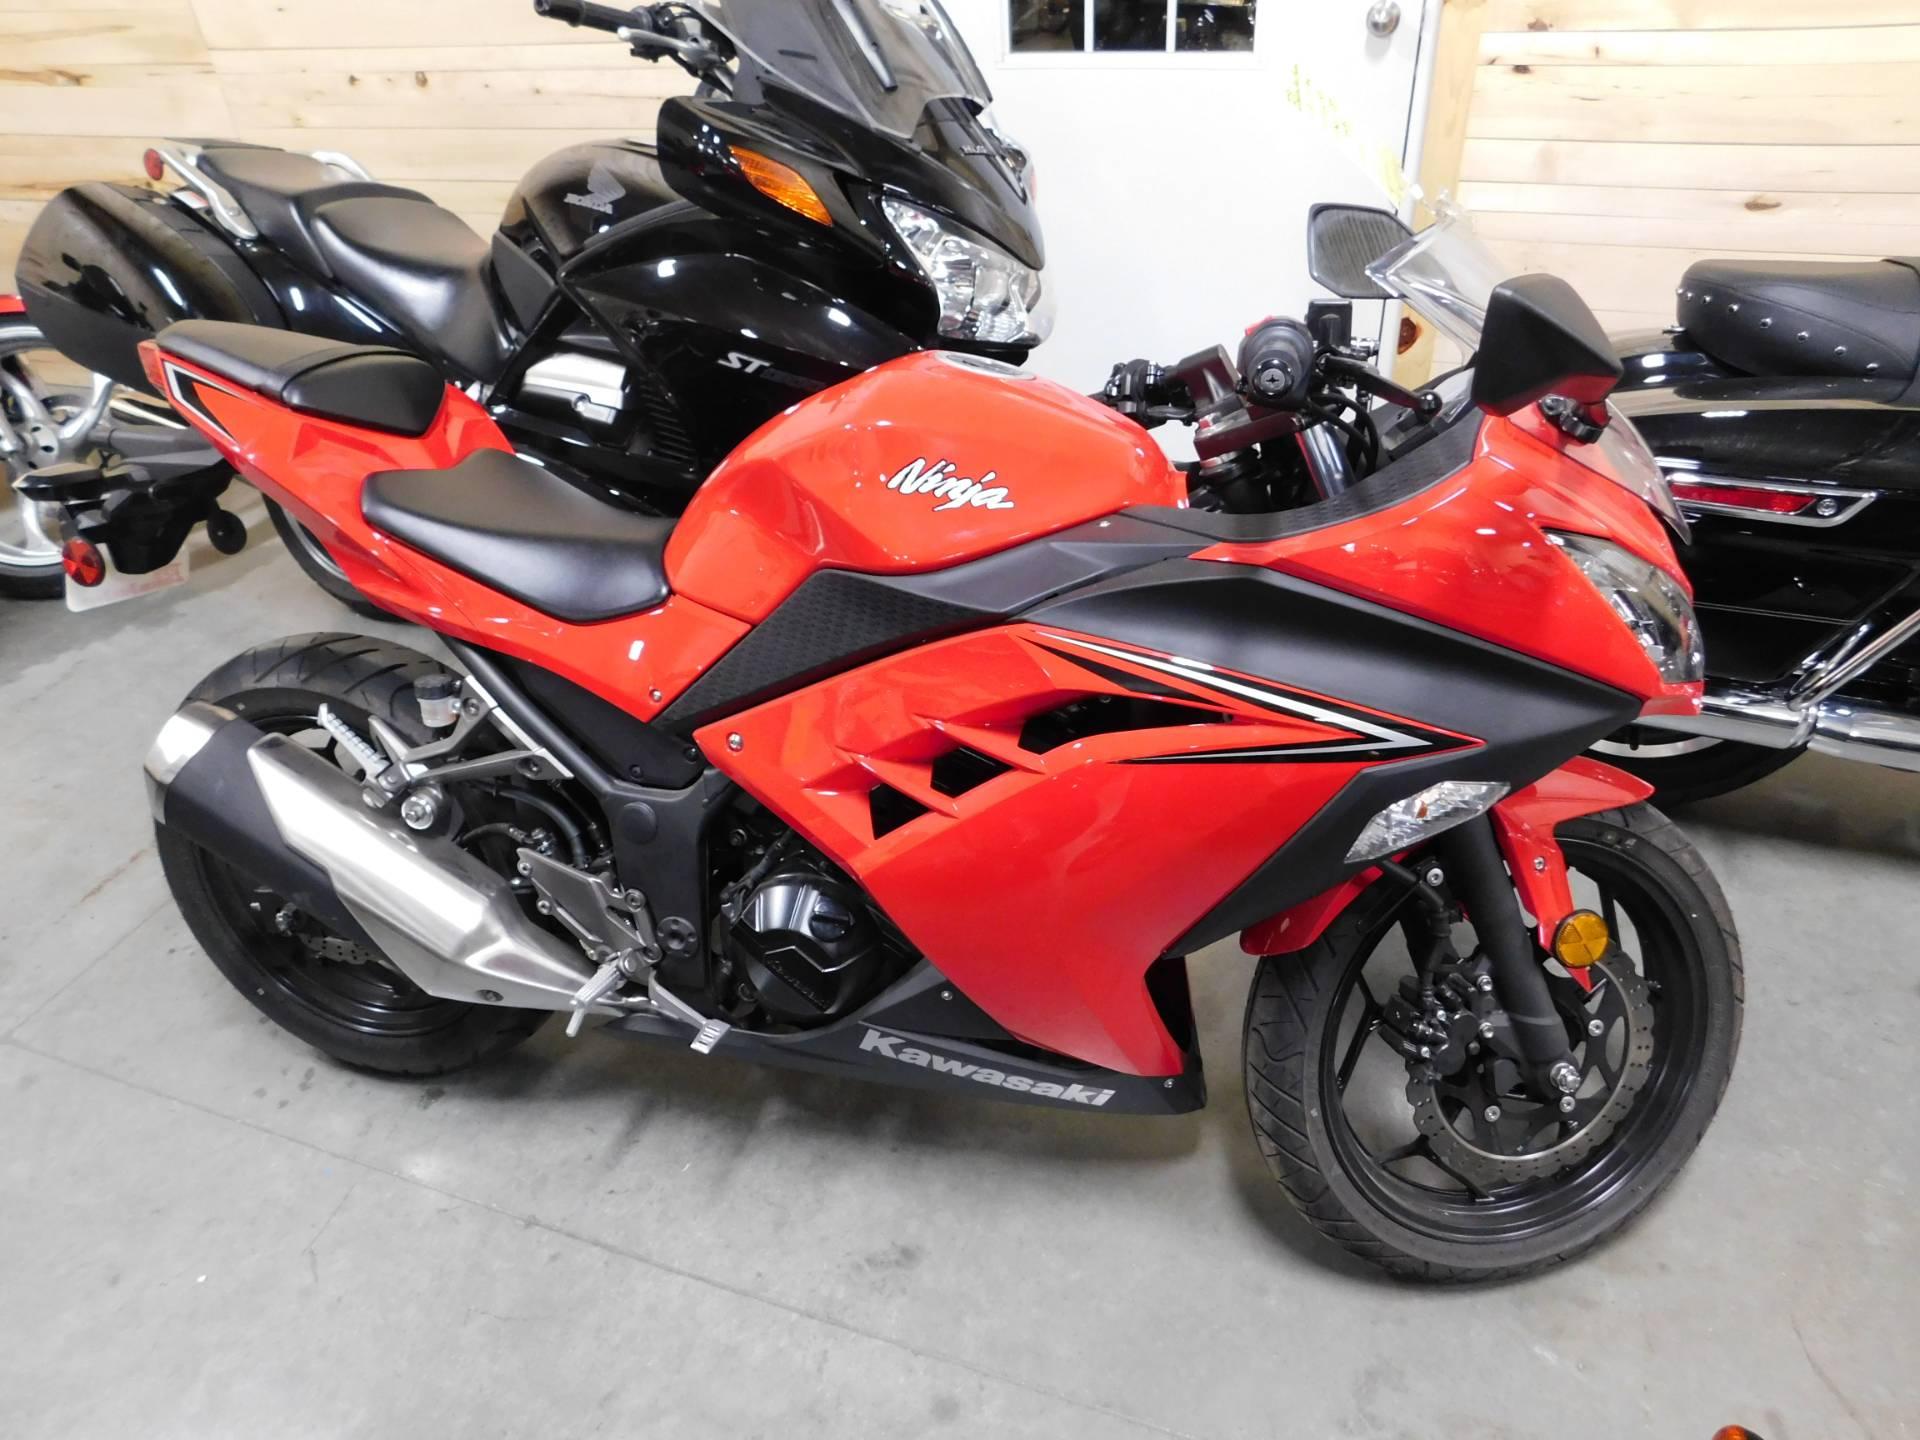 used 2016 kawasaki ninja 300 motorcycles in sauk rapids, mn stock Kawasaki Ninja 350 2016 kawasaki ninja 300 in sauk rapids, minnesota